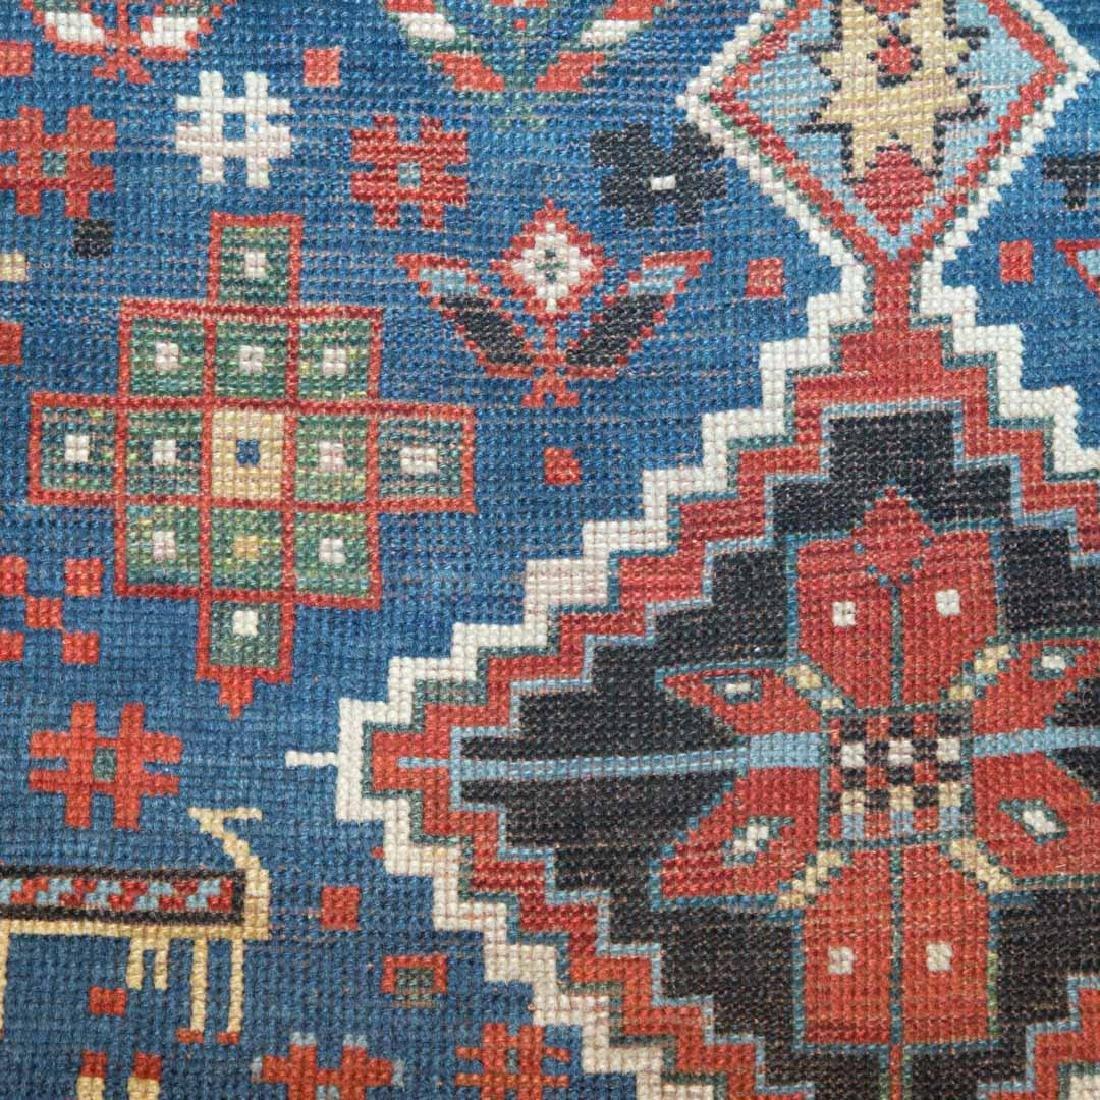 Antique Kazak rug, approx. 3.10 x 7.7 - 4